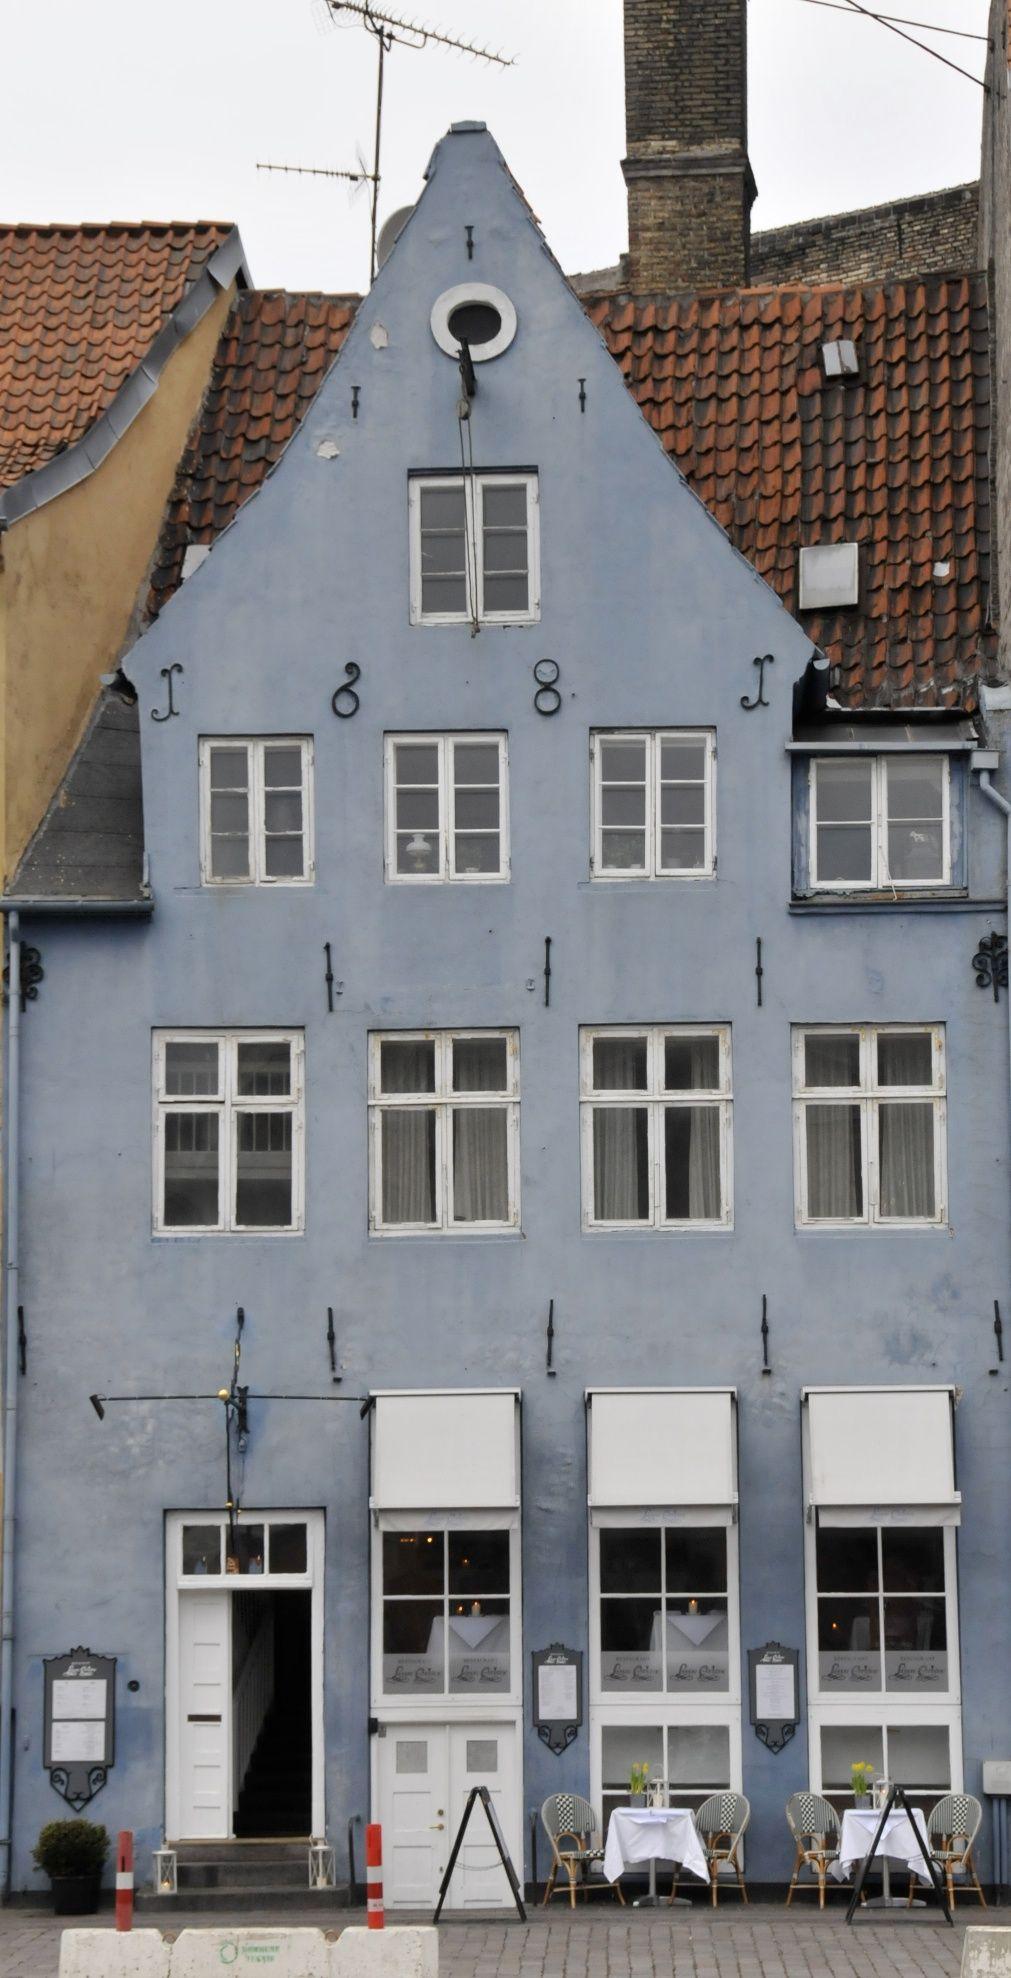 Old house at Nyhavn, the old harbor in Copenhagen.  #nyhavn #copenhagen #oldhouses